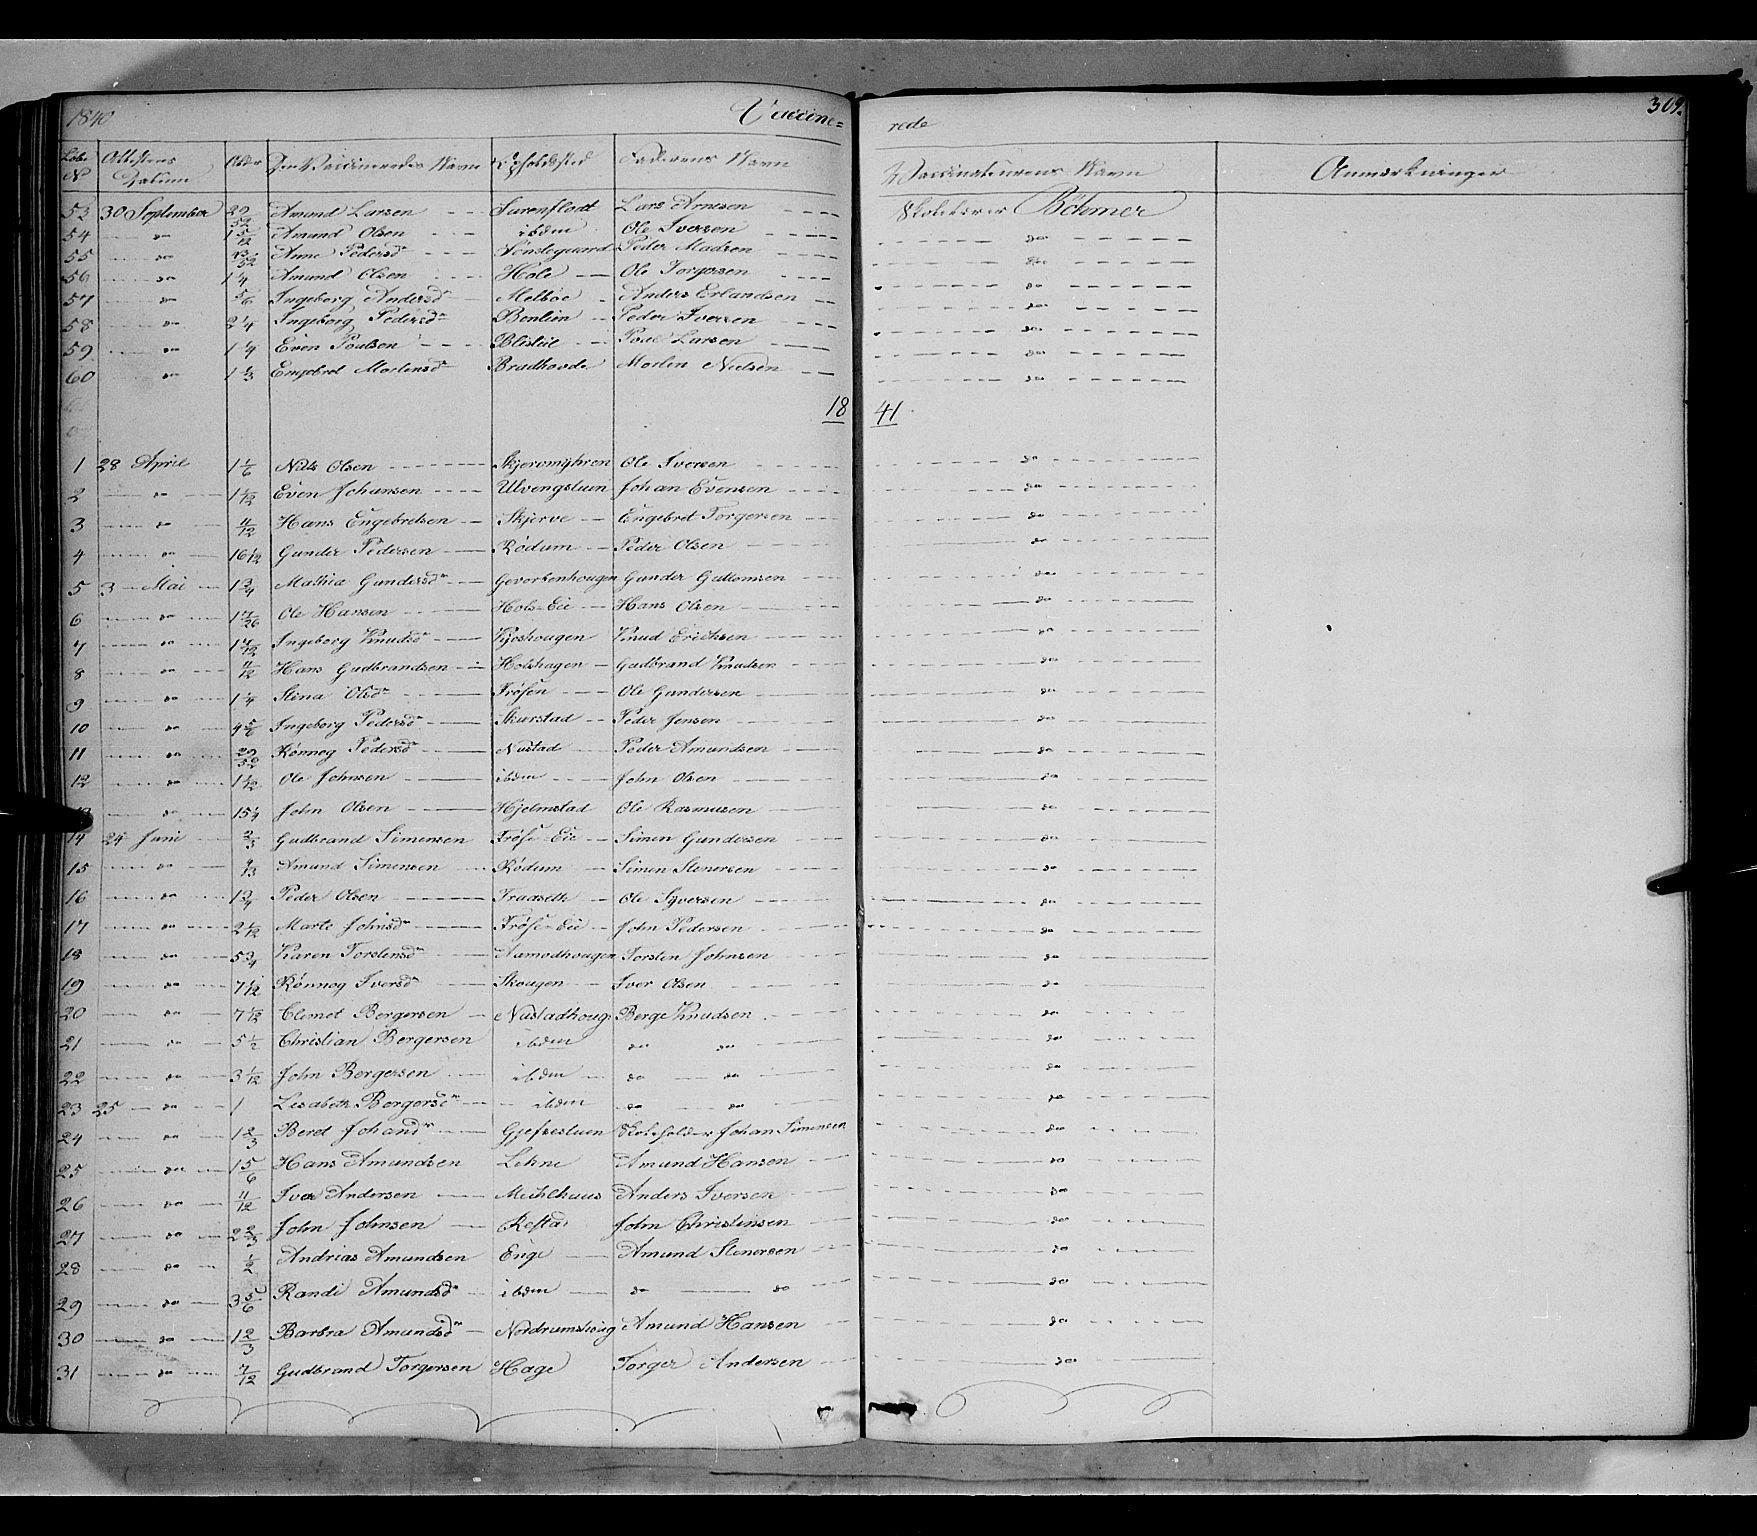 SAH, Gausdal prestekontor, Ministerialbok nr. 7, 1840-1850, s. 309